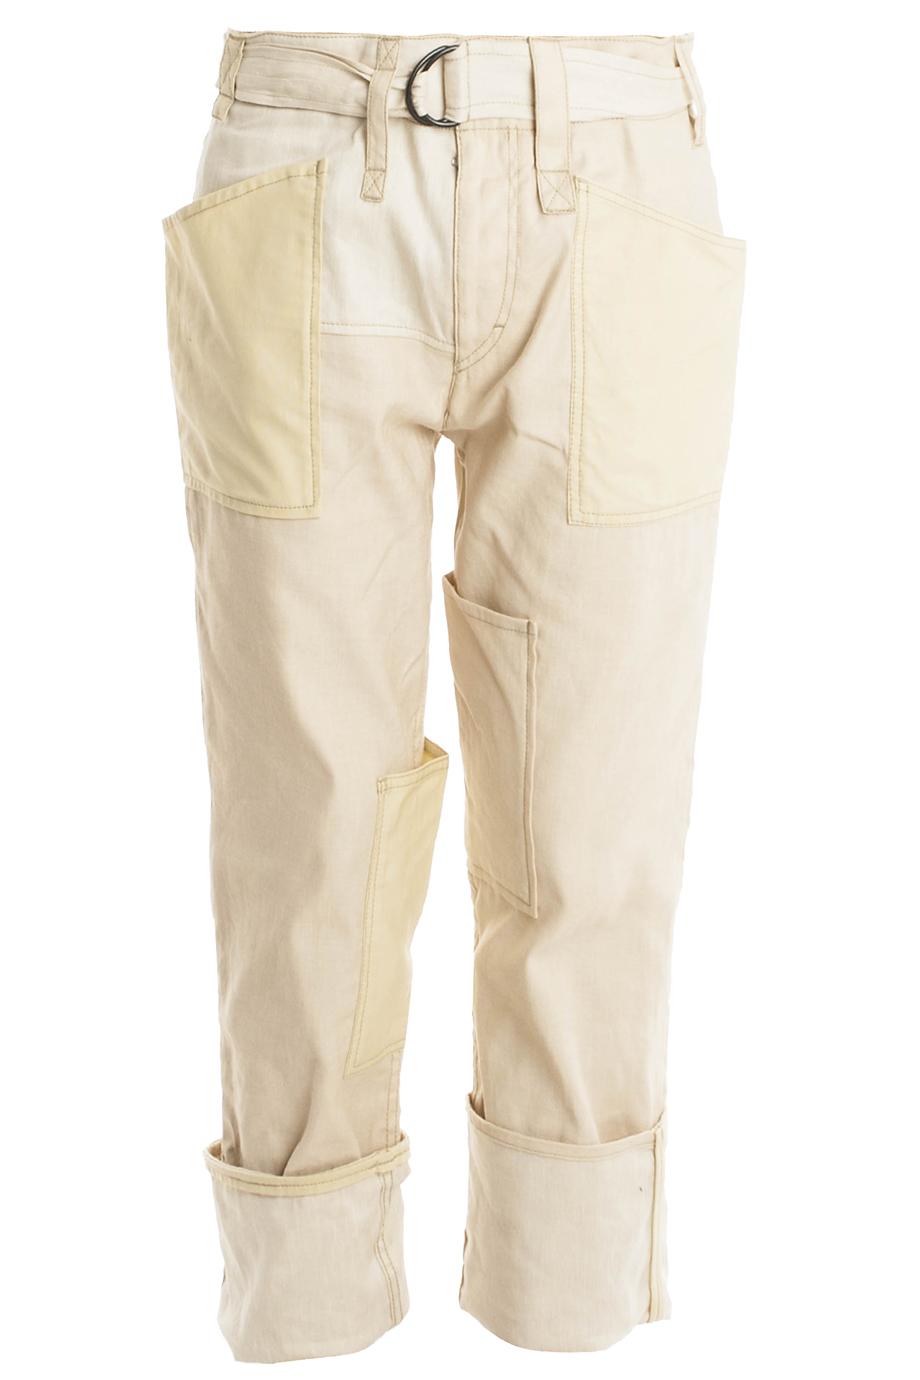 38046a6c17 Isabel Marant Vega Linen Trousers in White - Lyst